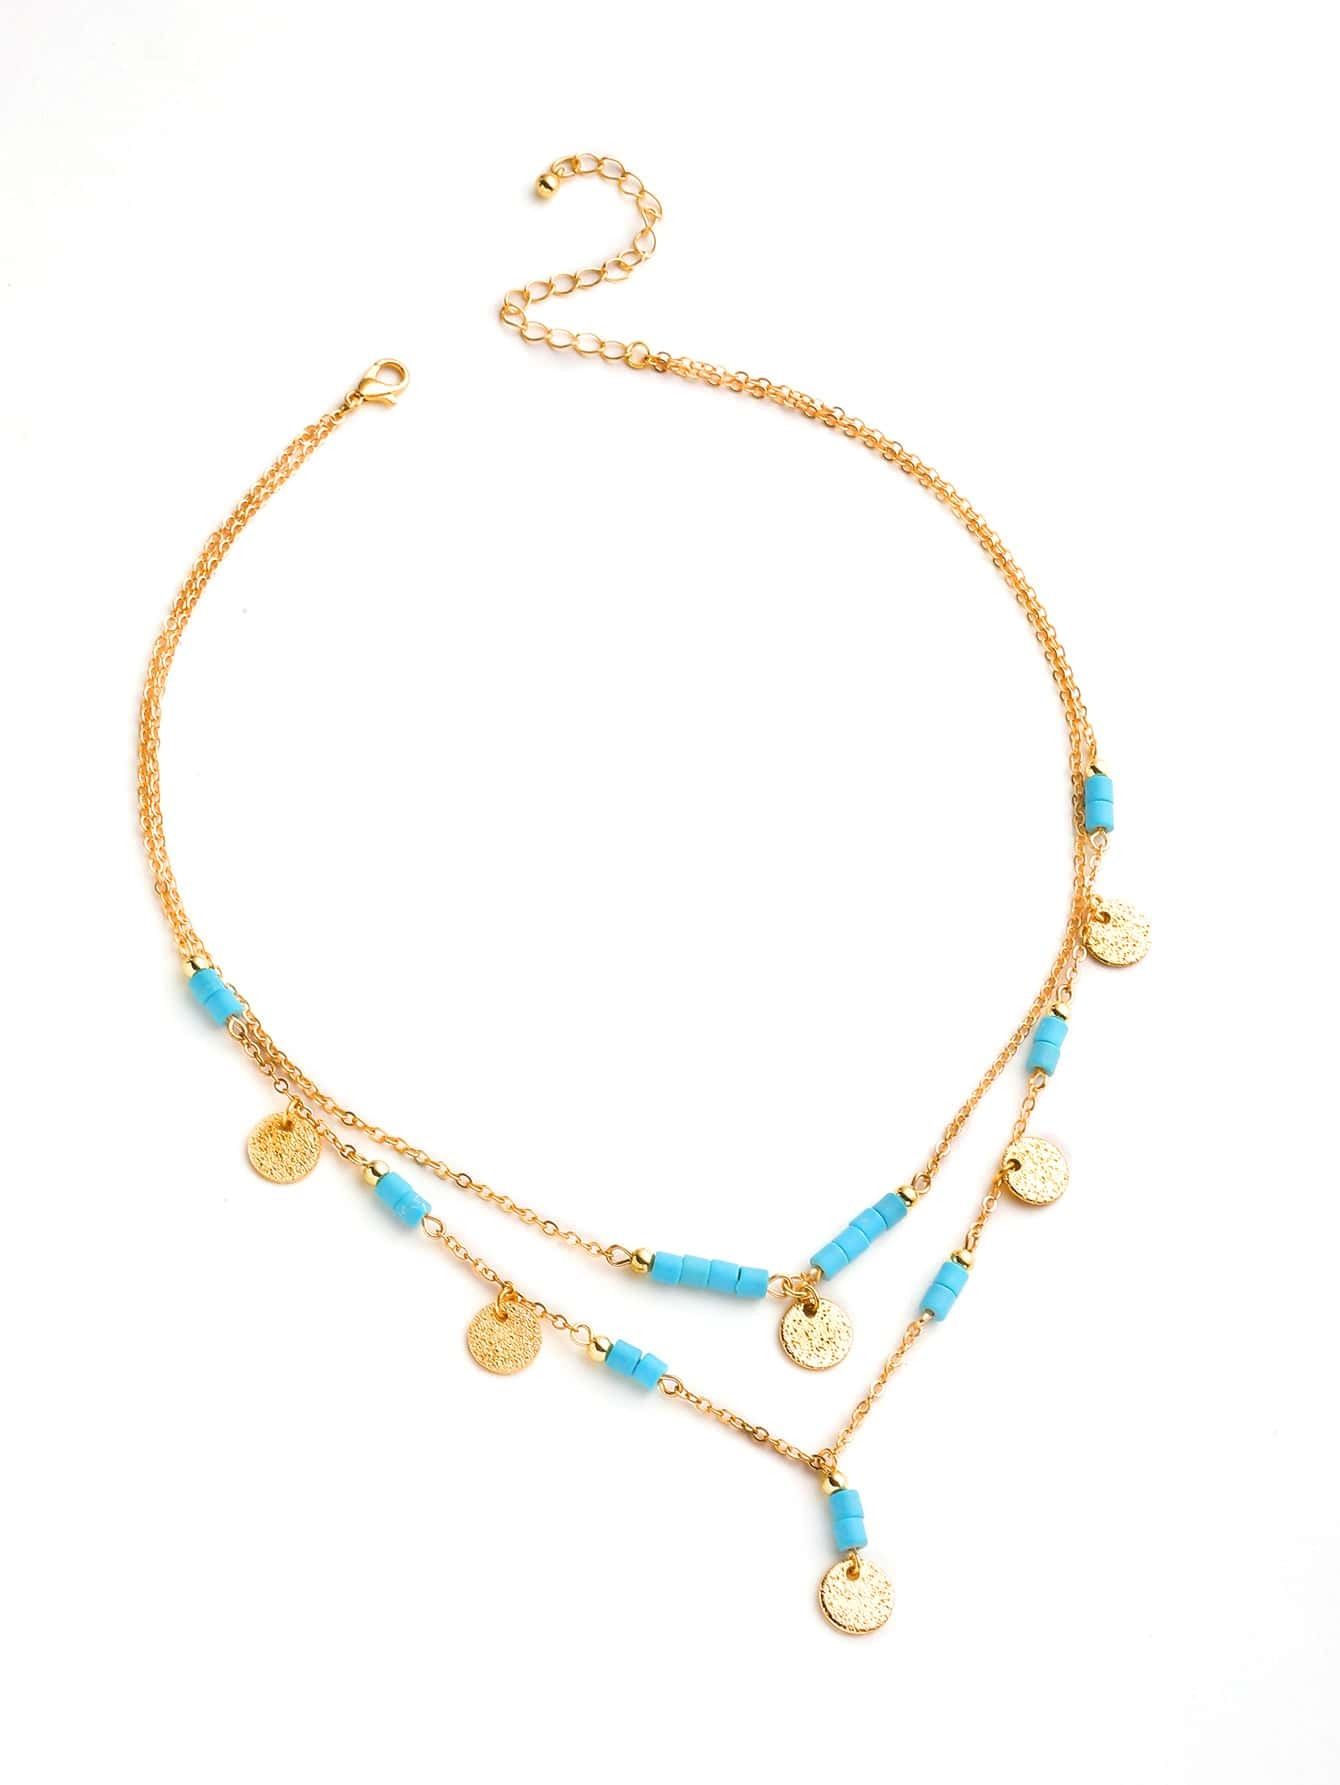 Фото Sequin And Turquoise Detail Layered Necklace. Купить с доставкой